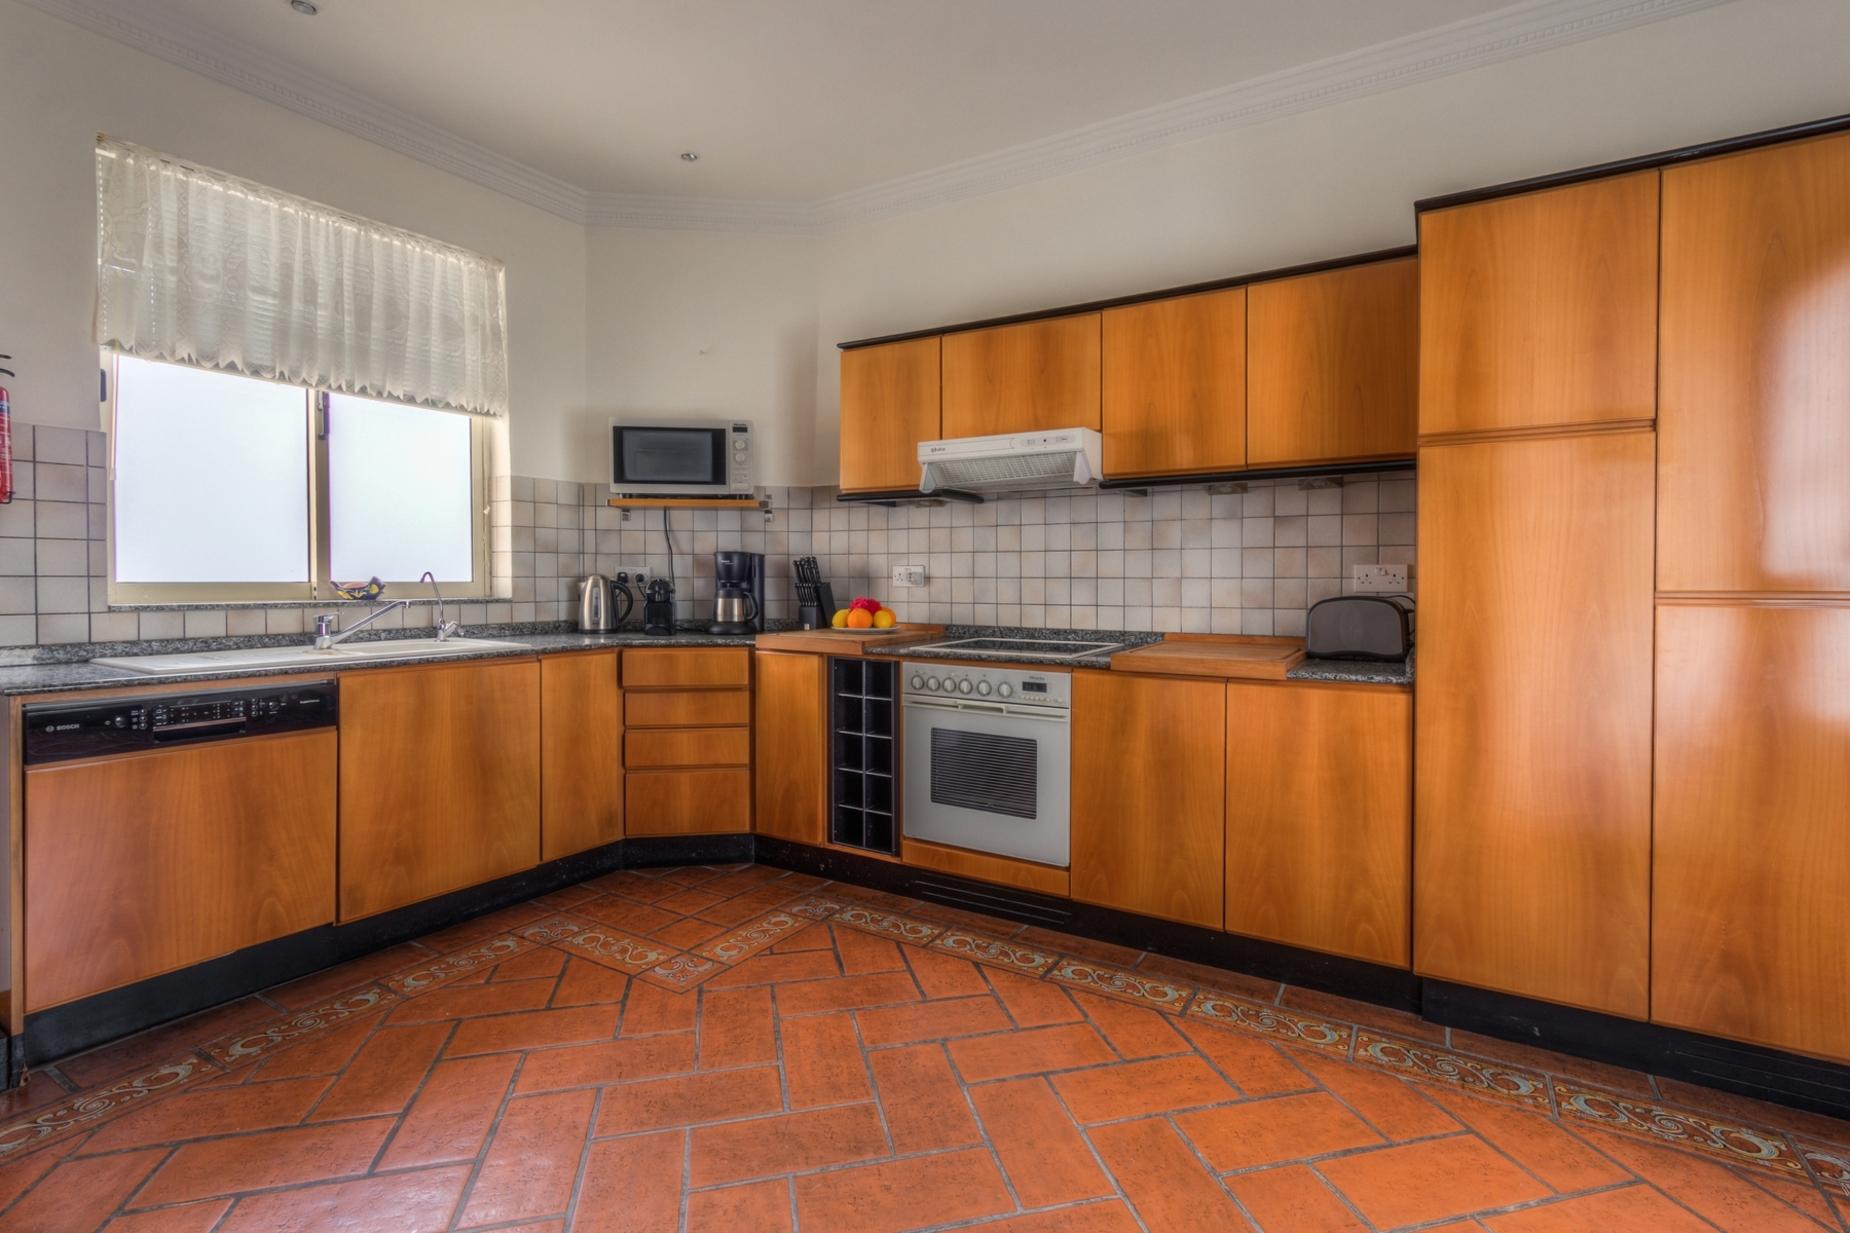 5 bed Villa For Sale in Mellieha, Mellieha - thumb 7